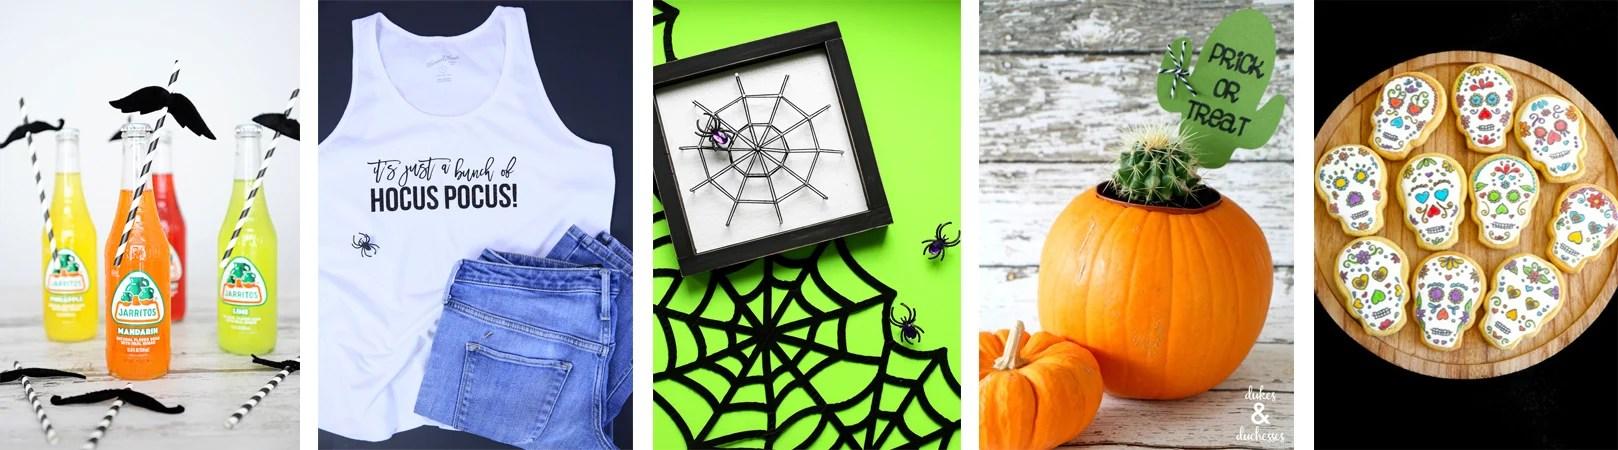 cute diy halloween crafts